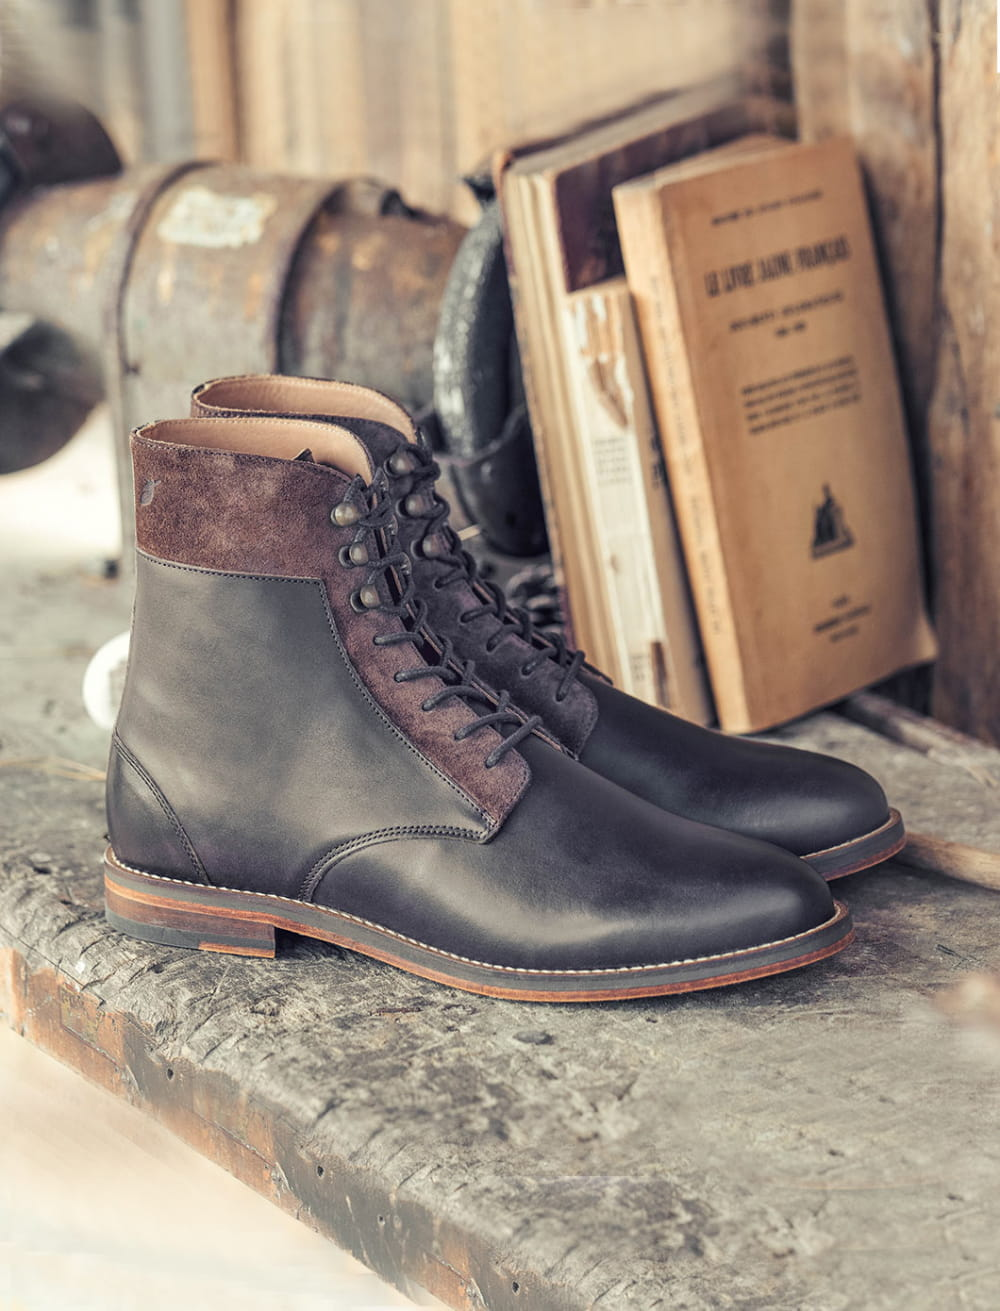 à boots Combat Combat à Chocolat Chocolat crochets boots crochets 8NPyvn0wOm